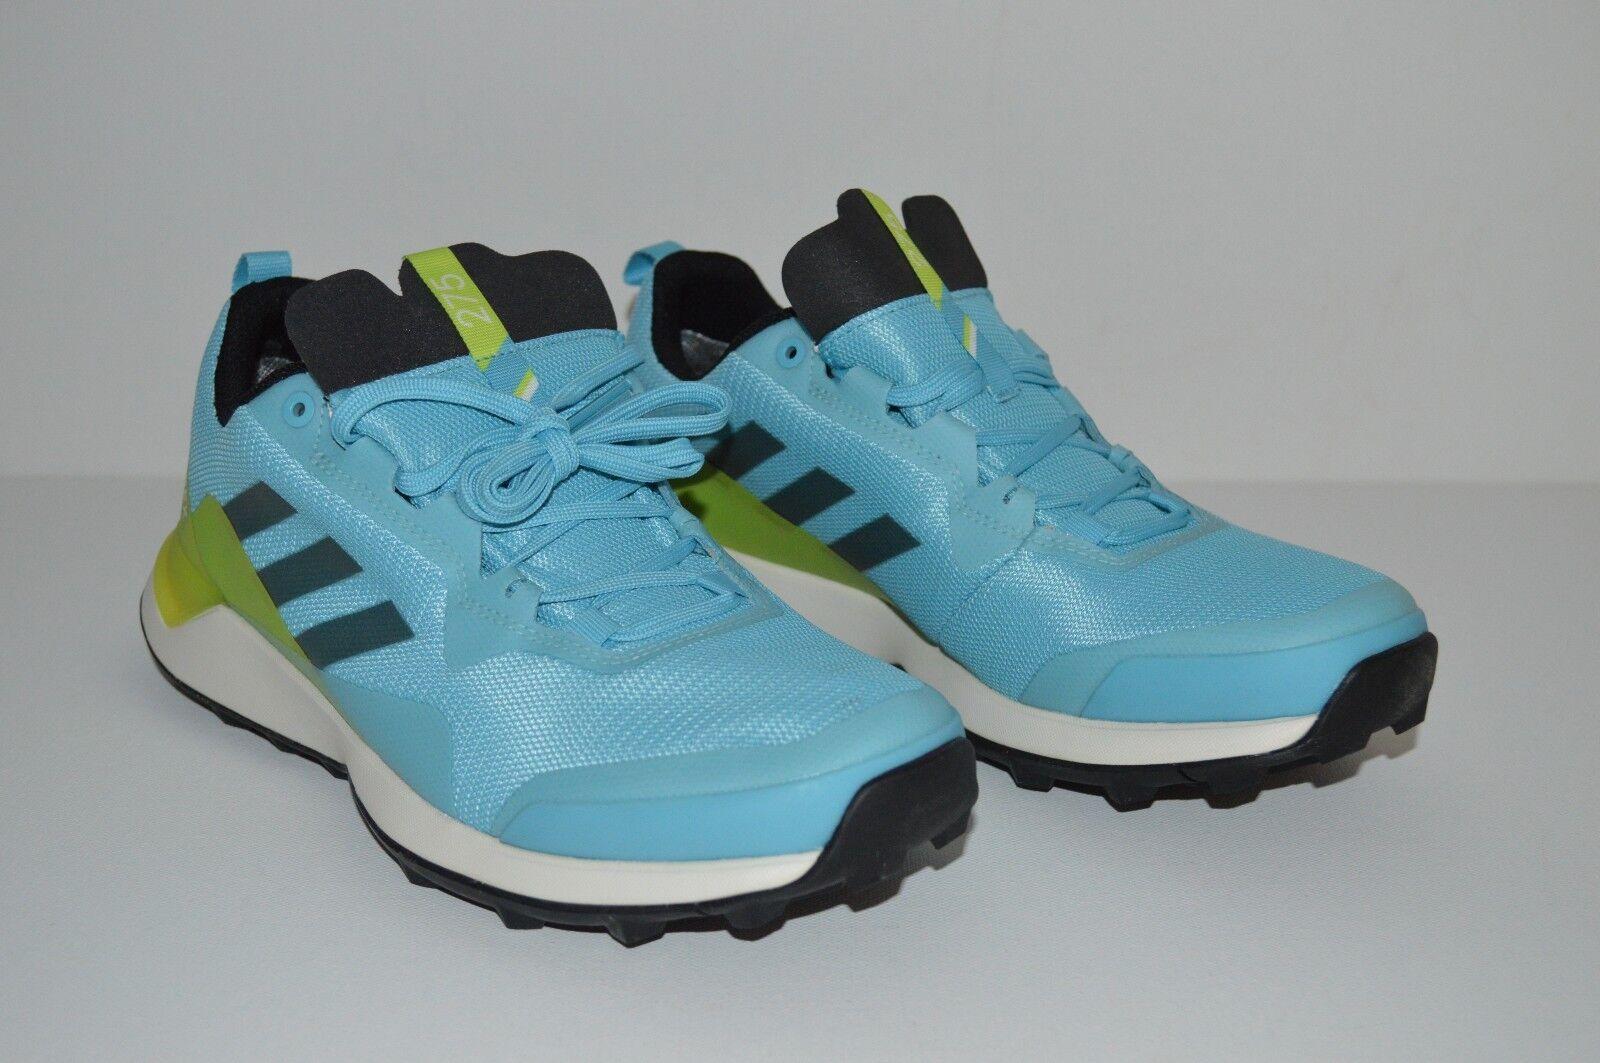 ADIDAS TERREX US CMTK GTX HIKING TRAIL Schuhe WOMEN'S SIZE US TERREX 8 Blau BY2773 f66c16